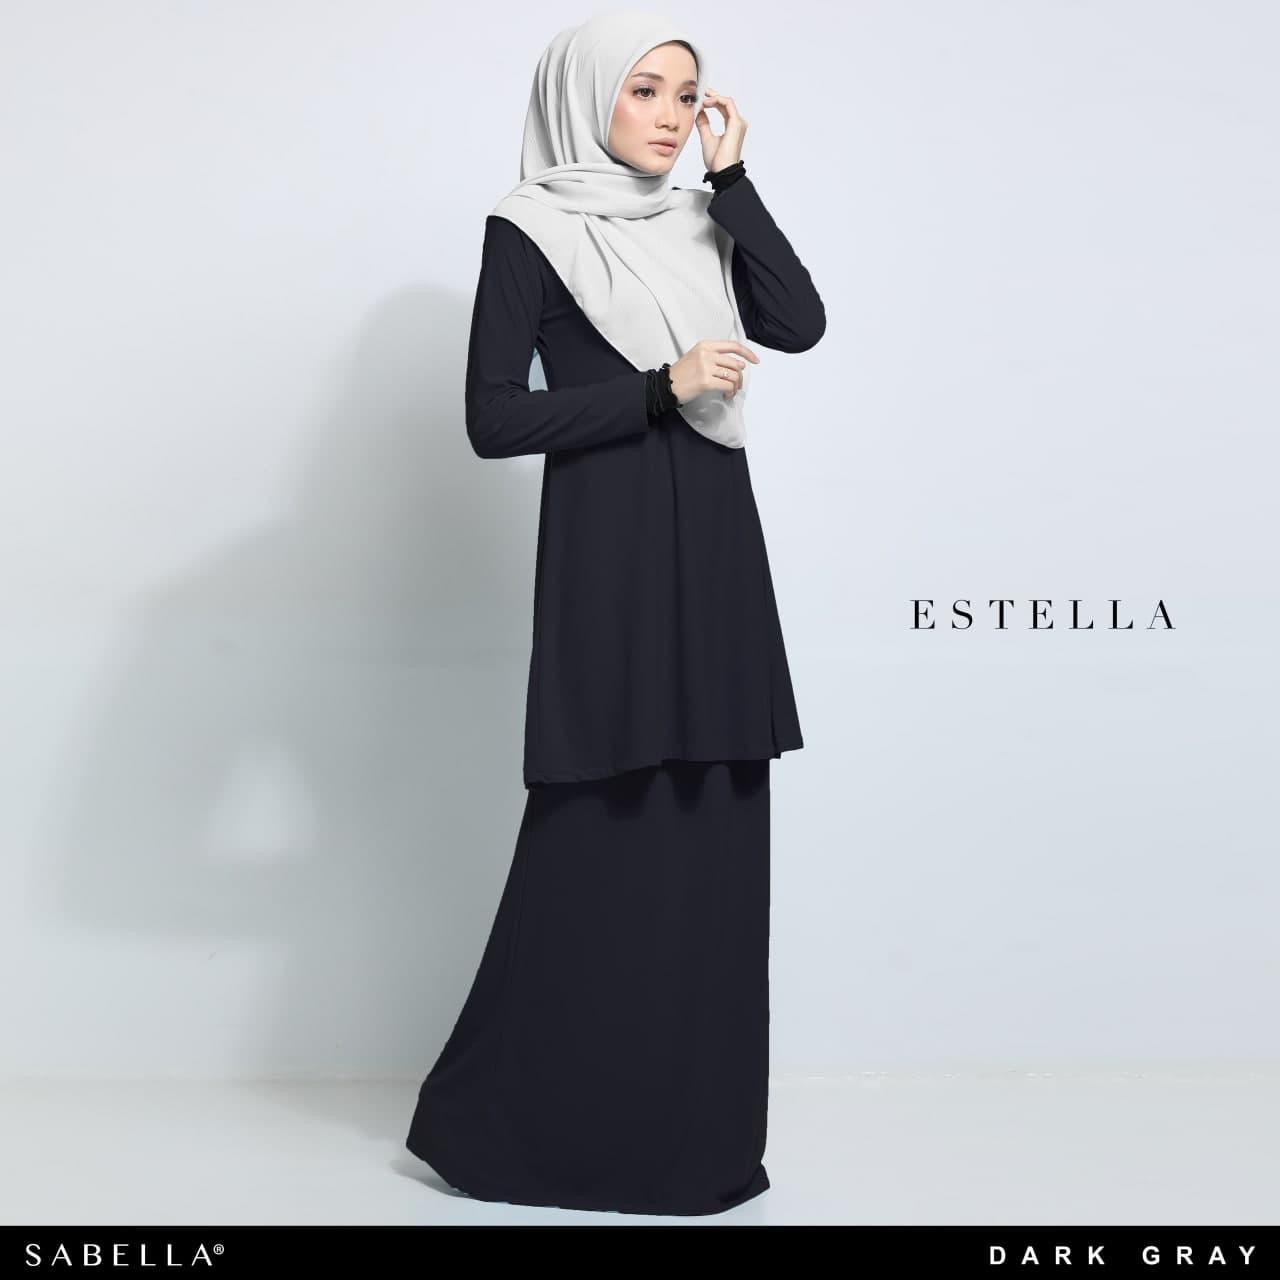 Estella 2.0 Dark Gray (R)